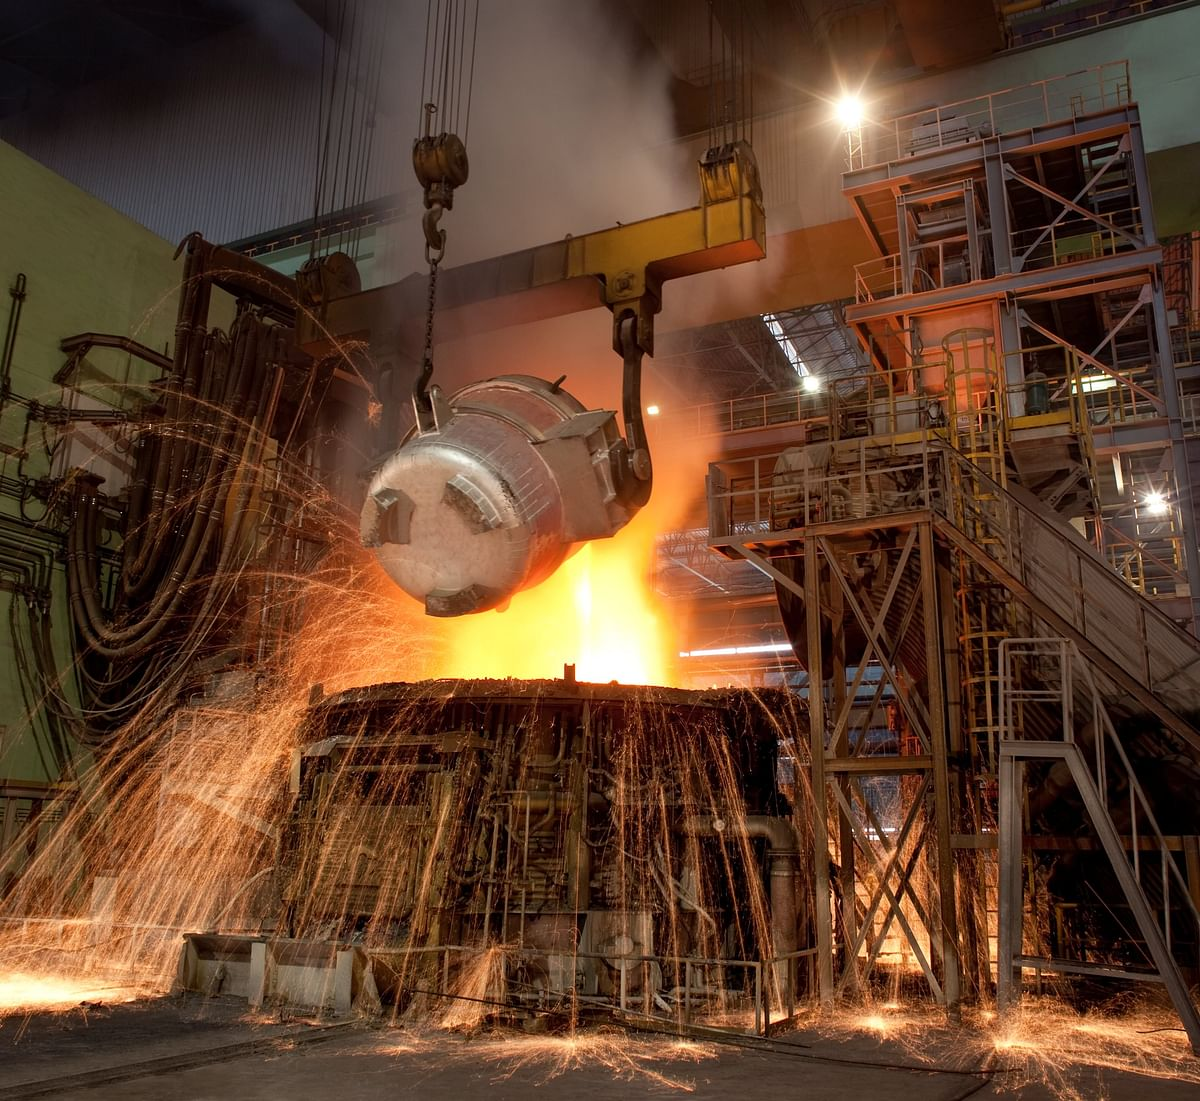 US Steel Production Capacity Utilization Slips in Week 03